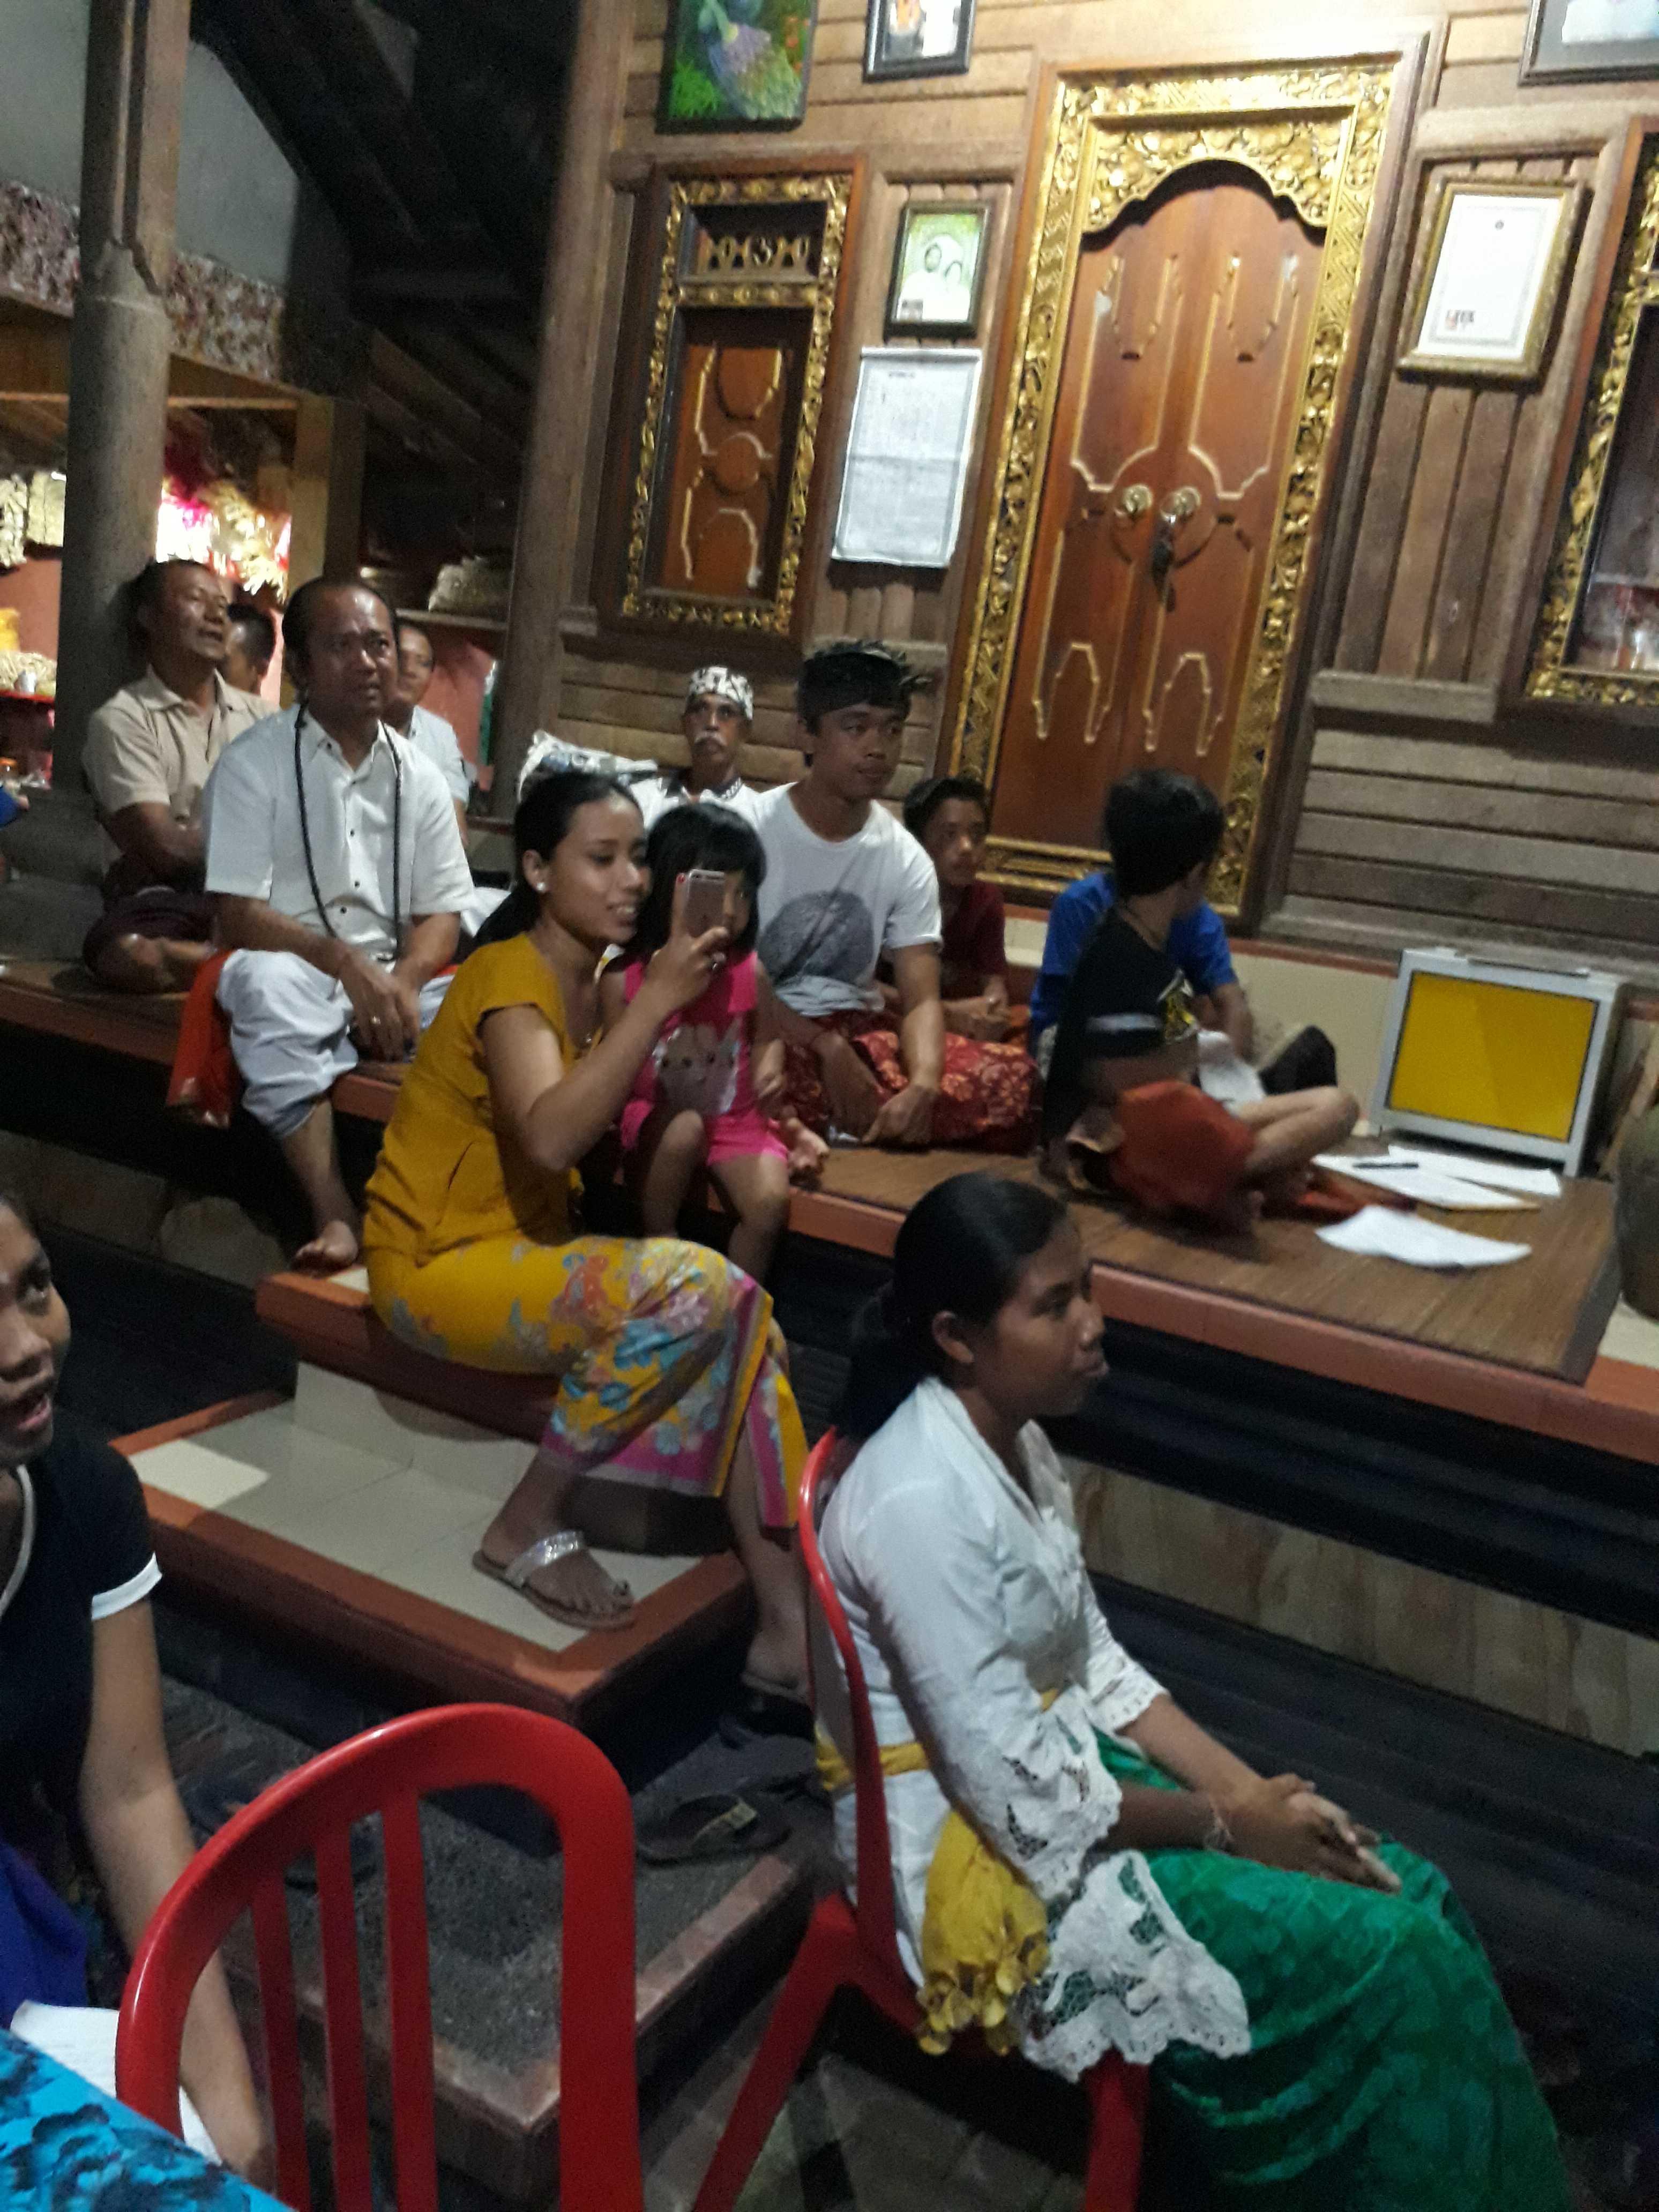 Suasana kelas Sanskerta di Rumah Sira Empu Yoga Sugata.